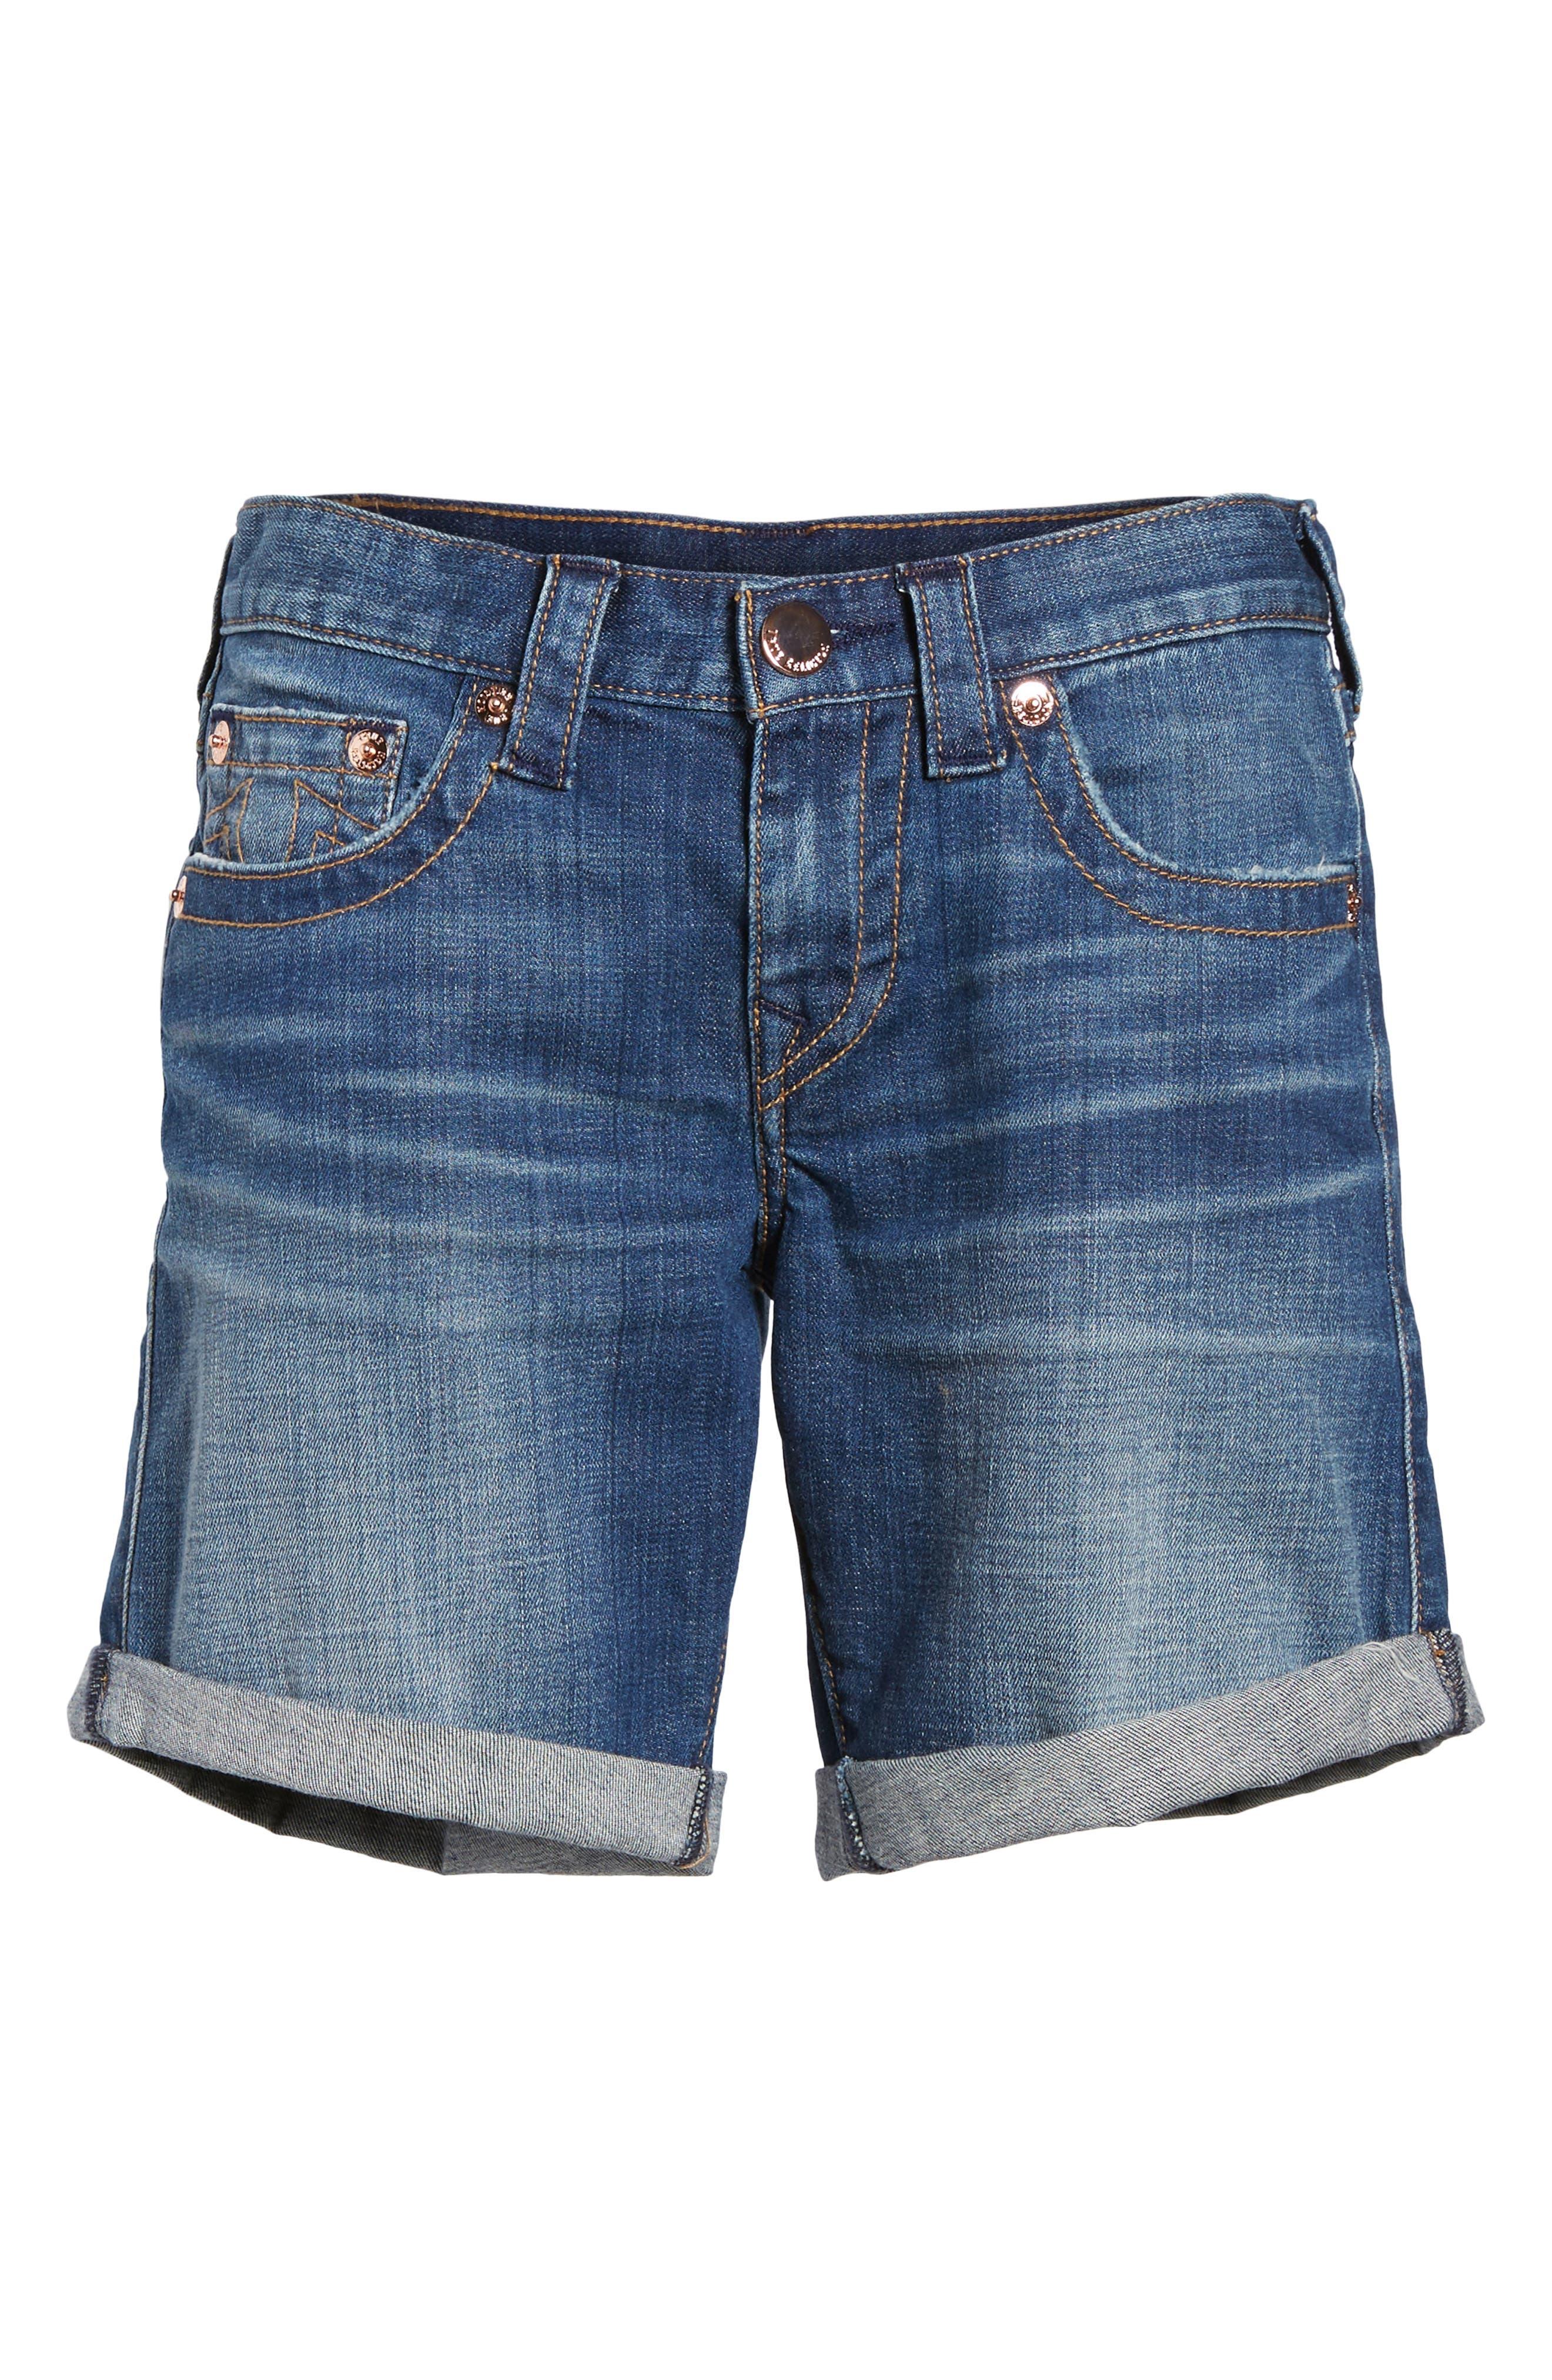 Jayde Shorts,                             Alternate thumbnail 6, color,                             Hardware Blue